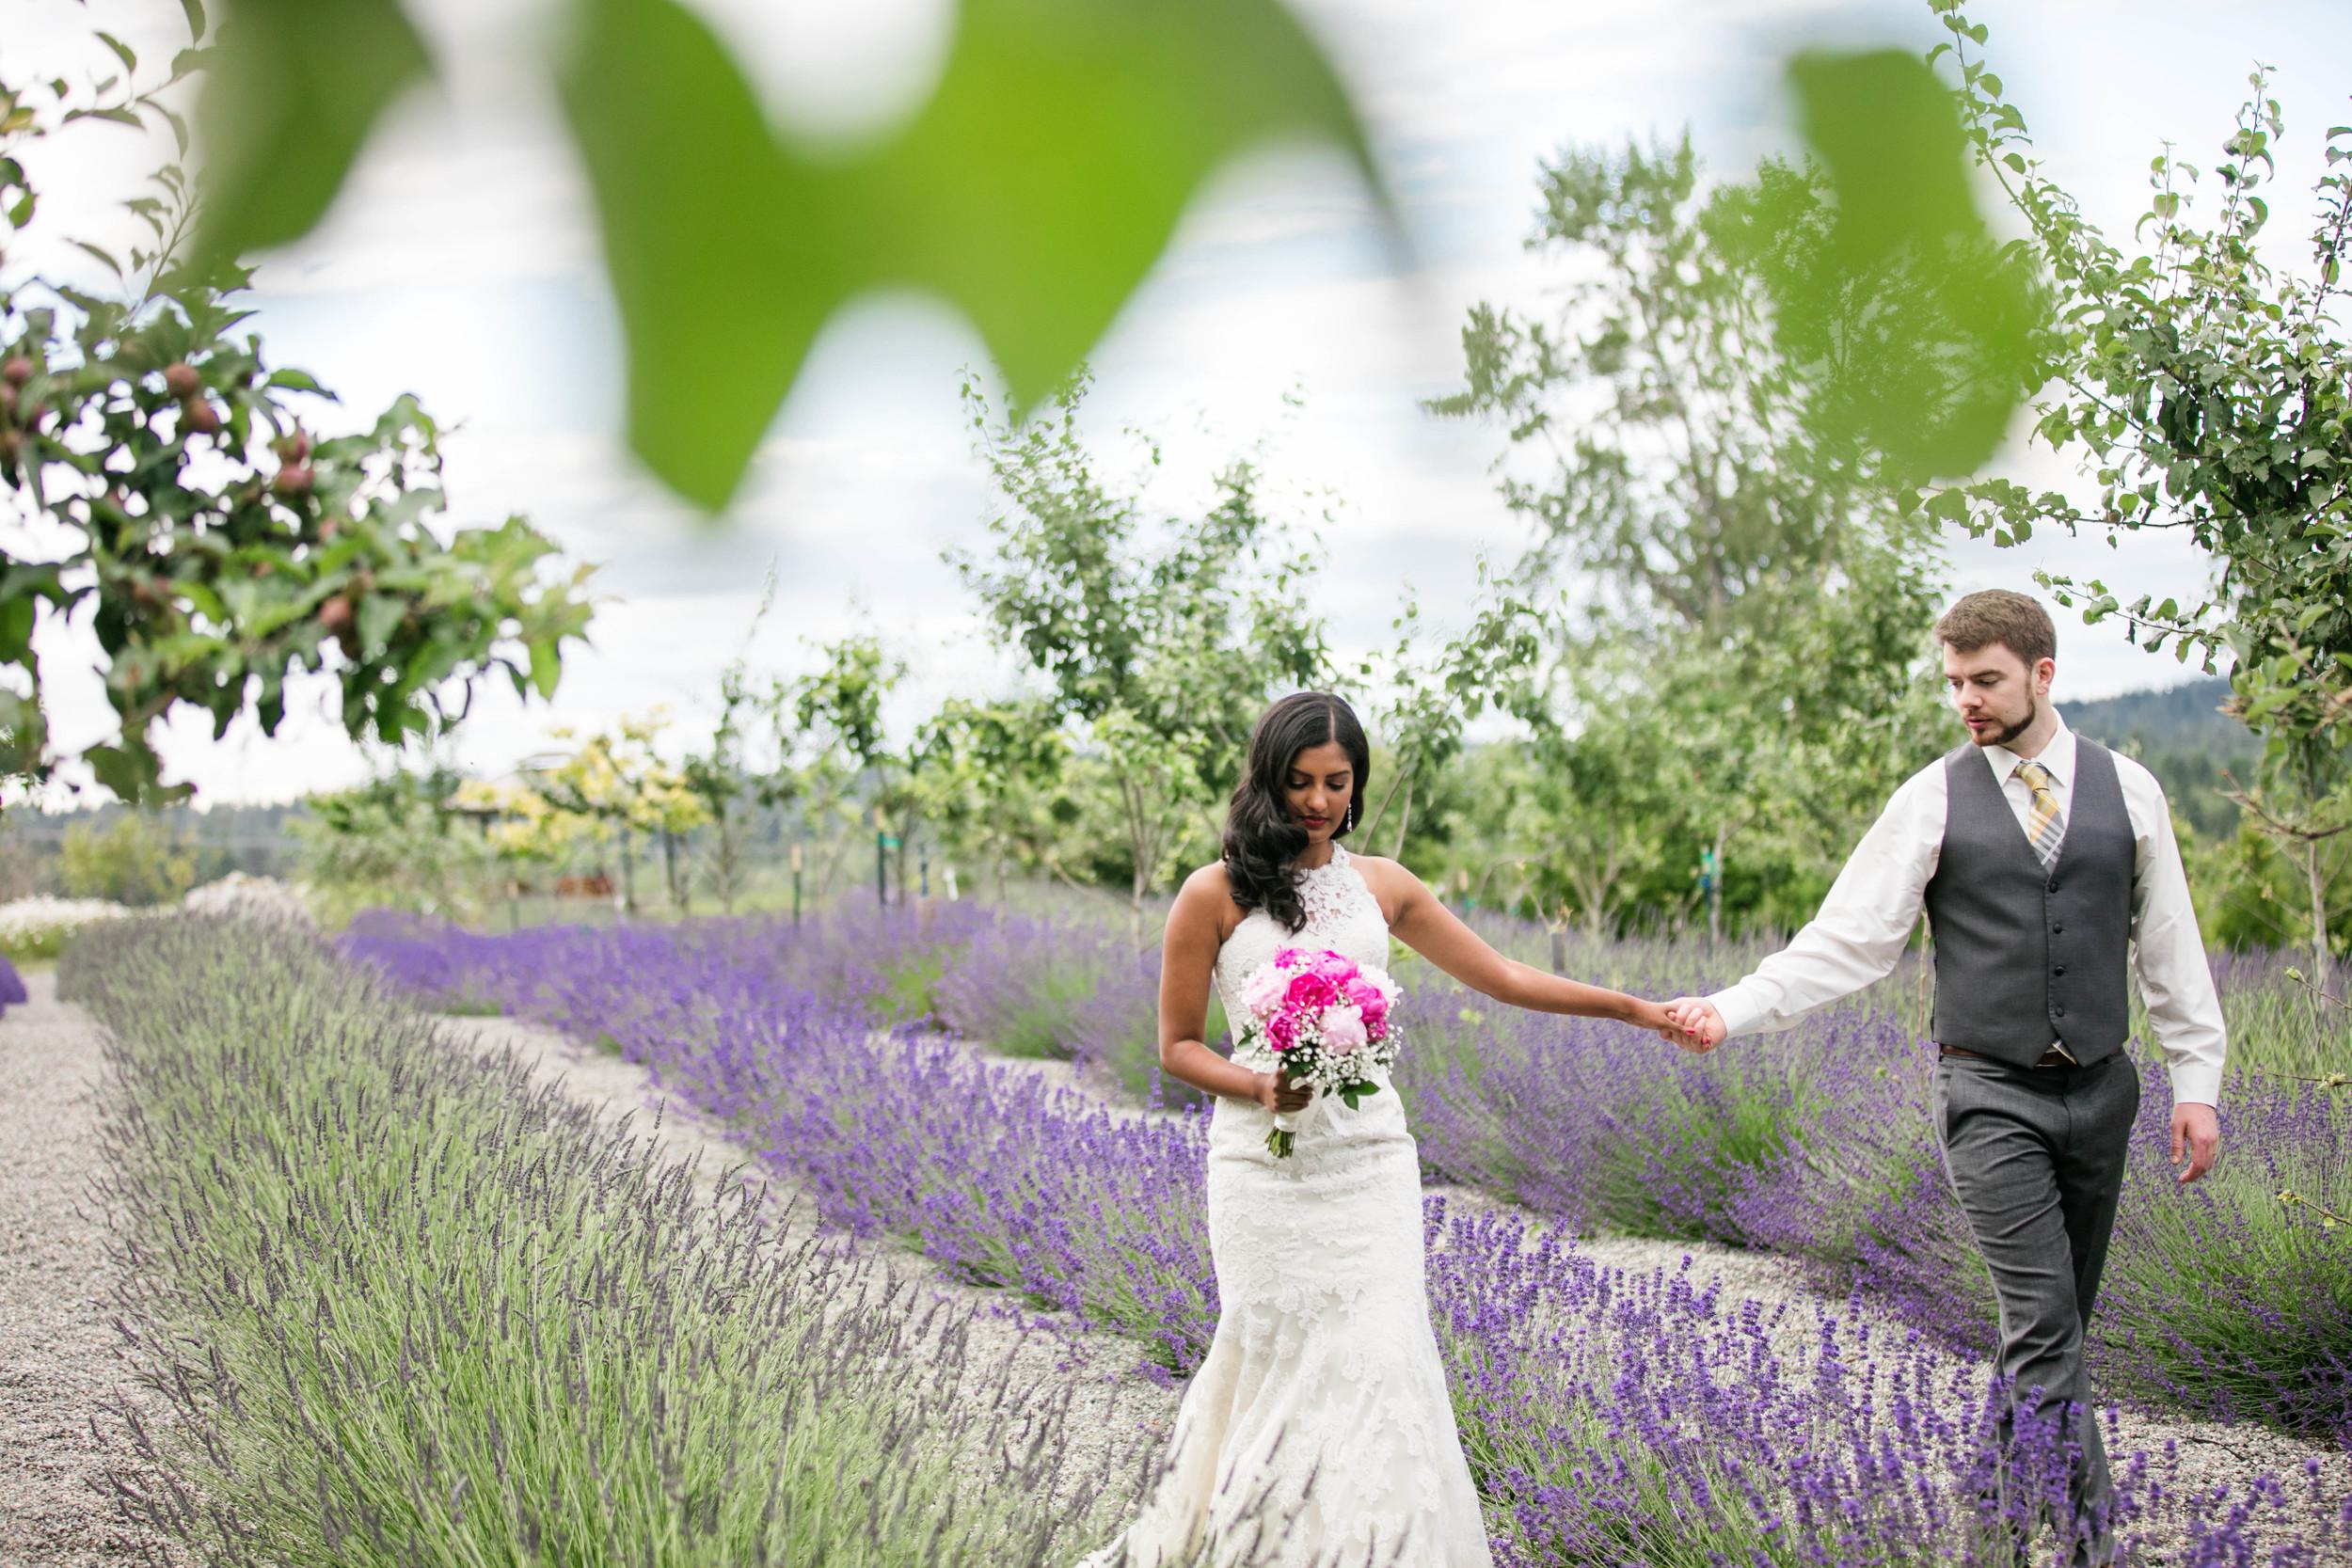 Hima+Dan_Wedding_Seattle+Couple_Kingston_6112016_158.jpg